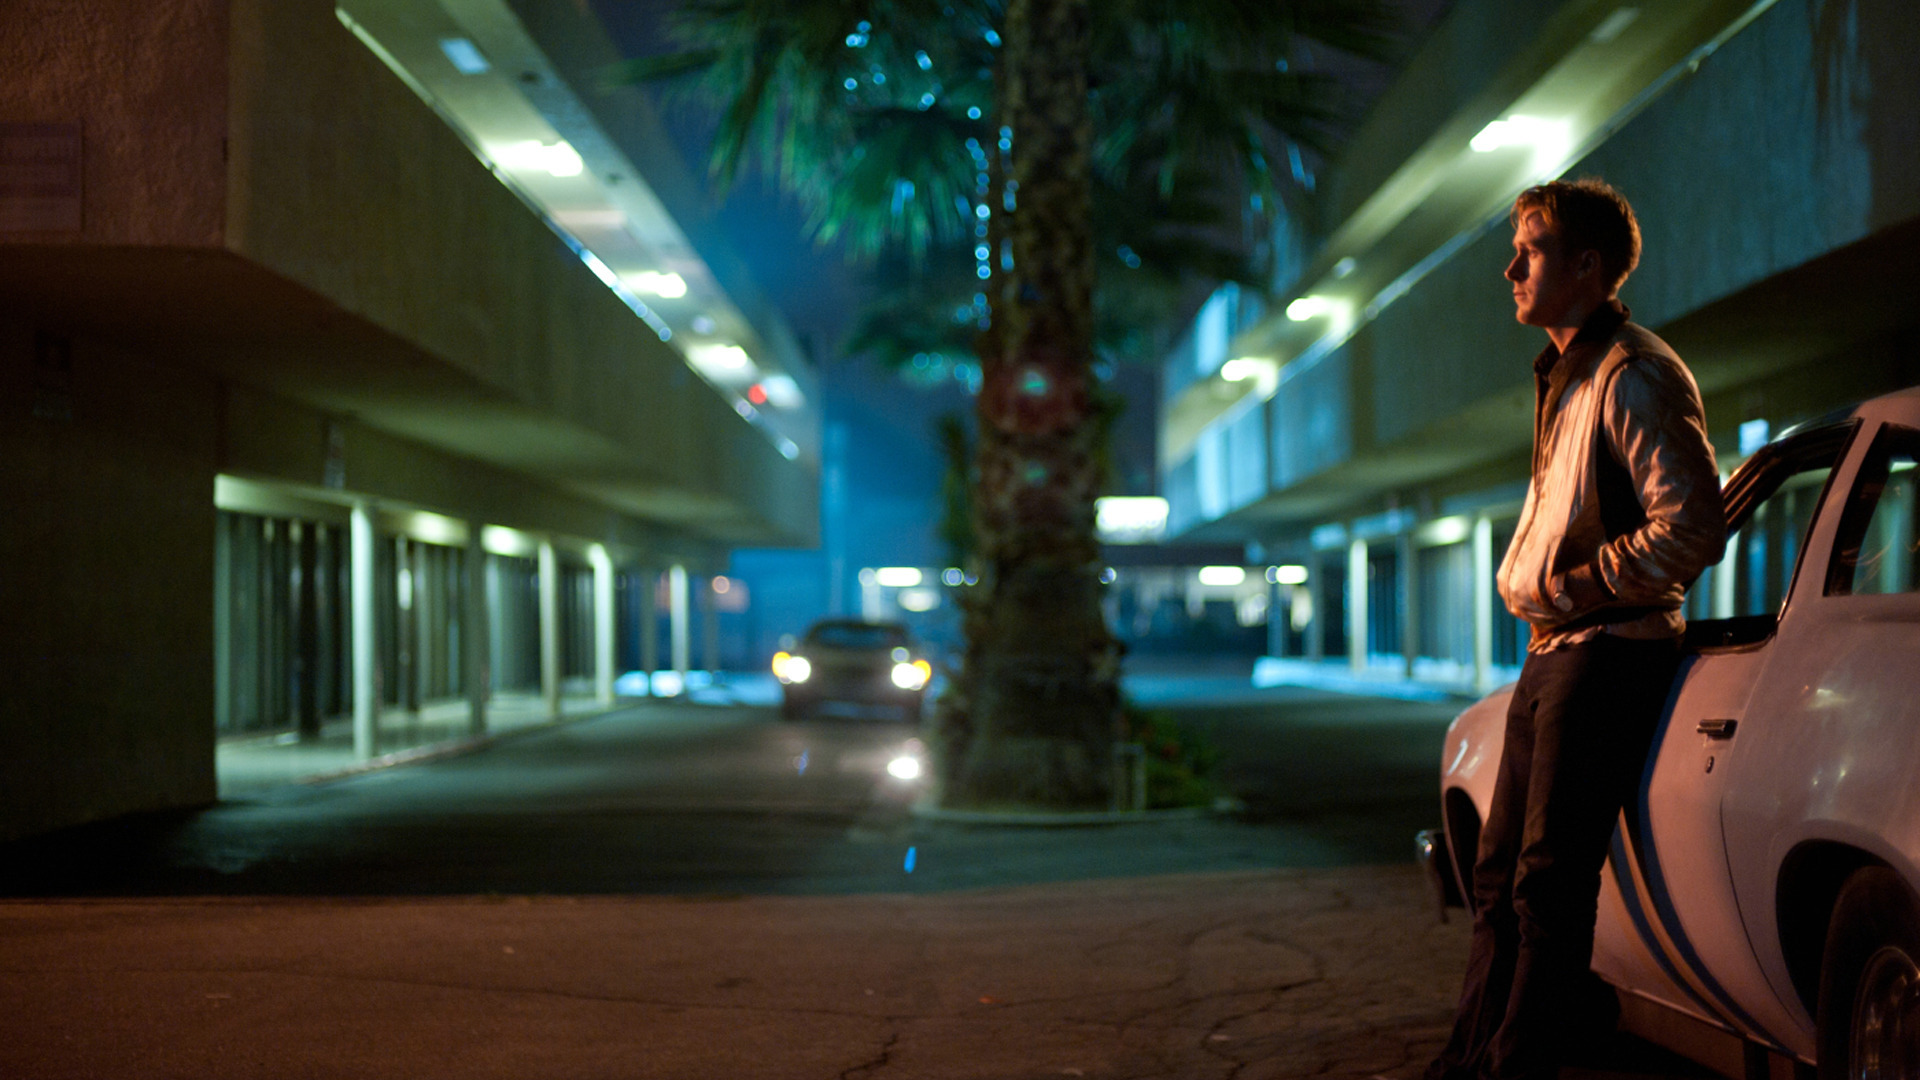 drive-movie-review-image-header.jpg